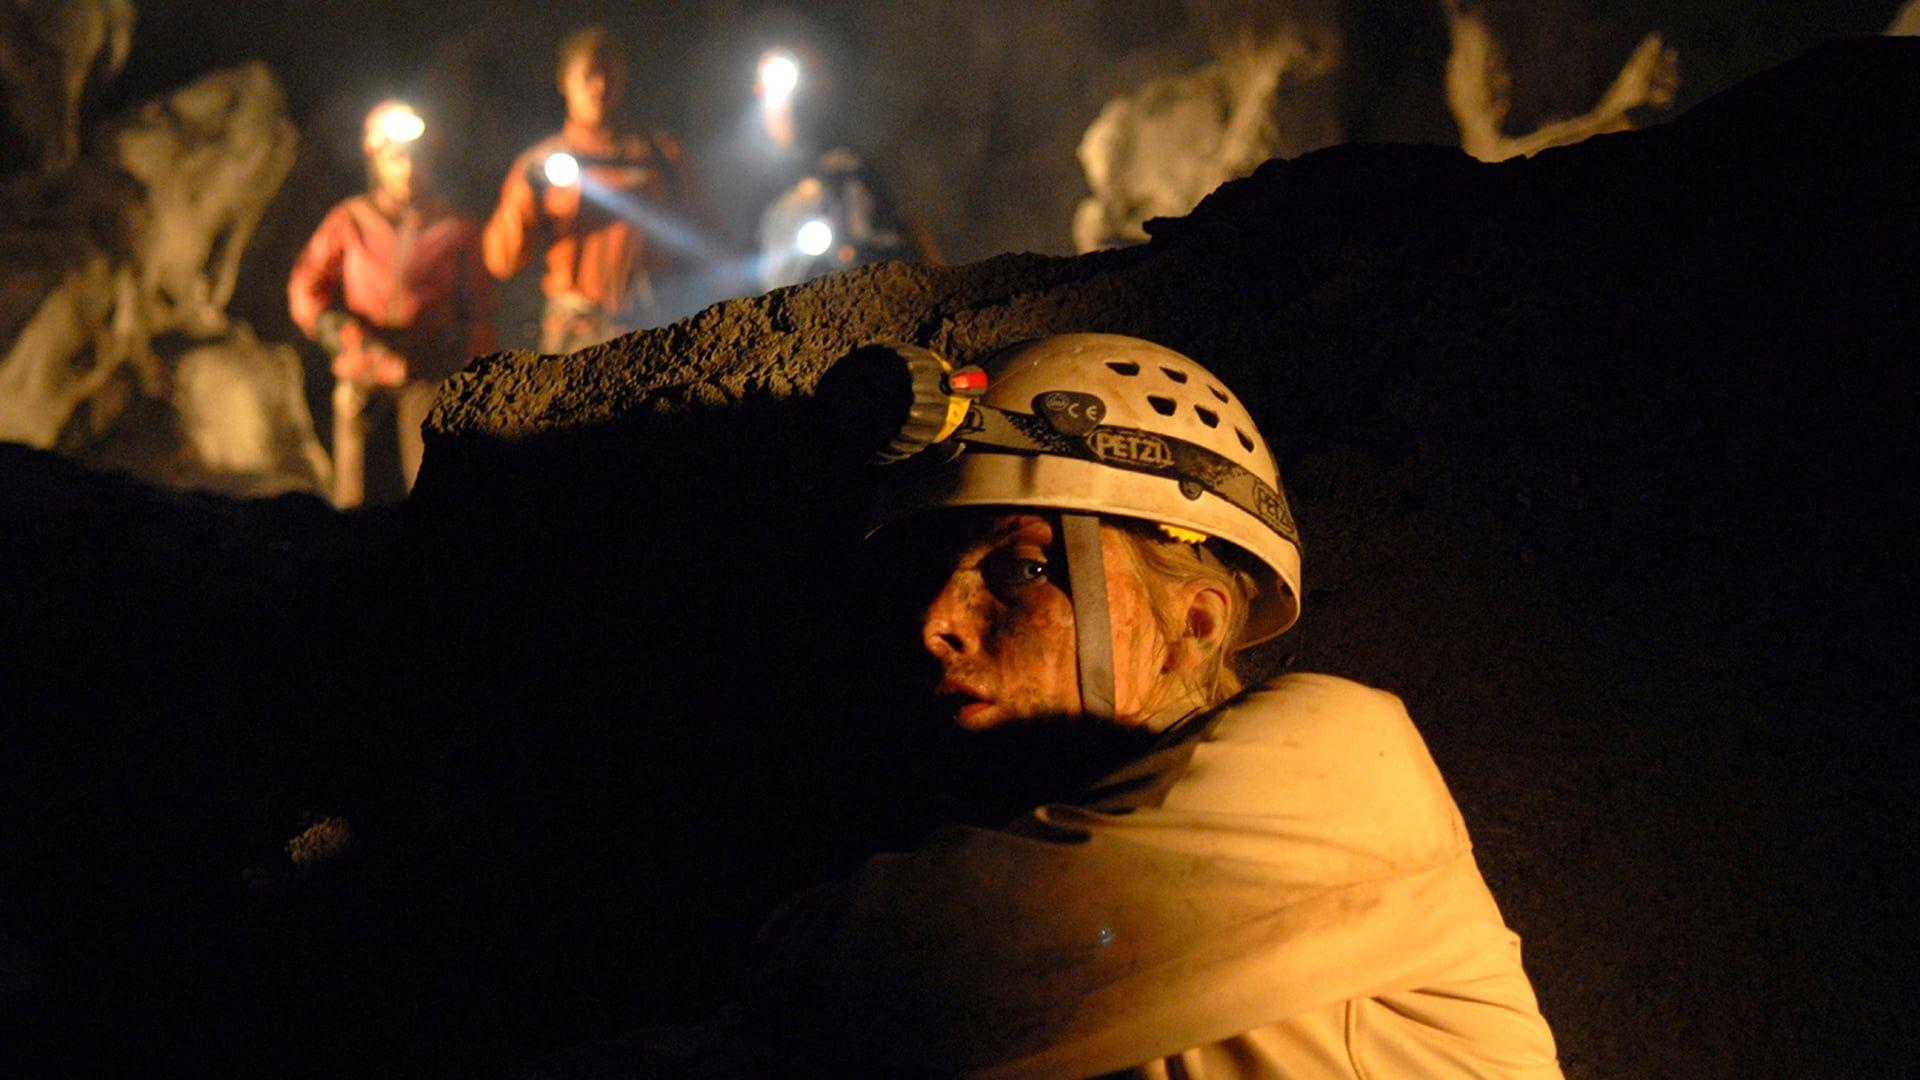 Rescapee De L Expedition Speleologique De The Descent Sarah Emerge Seule Des Grottes Des Appalaches Full Movies Online Free Free Movies Online Full Movies